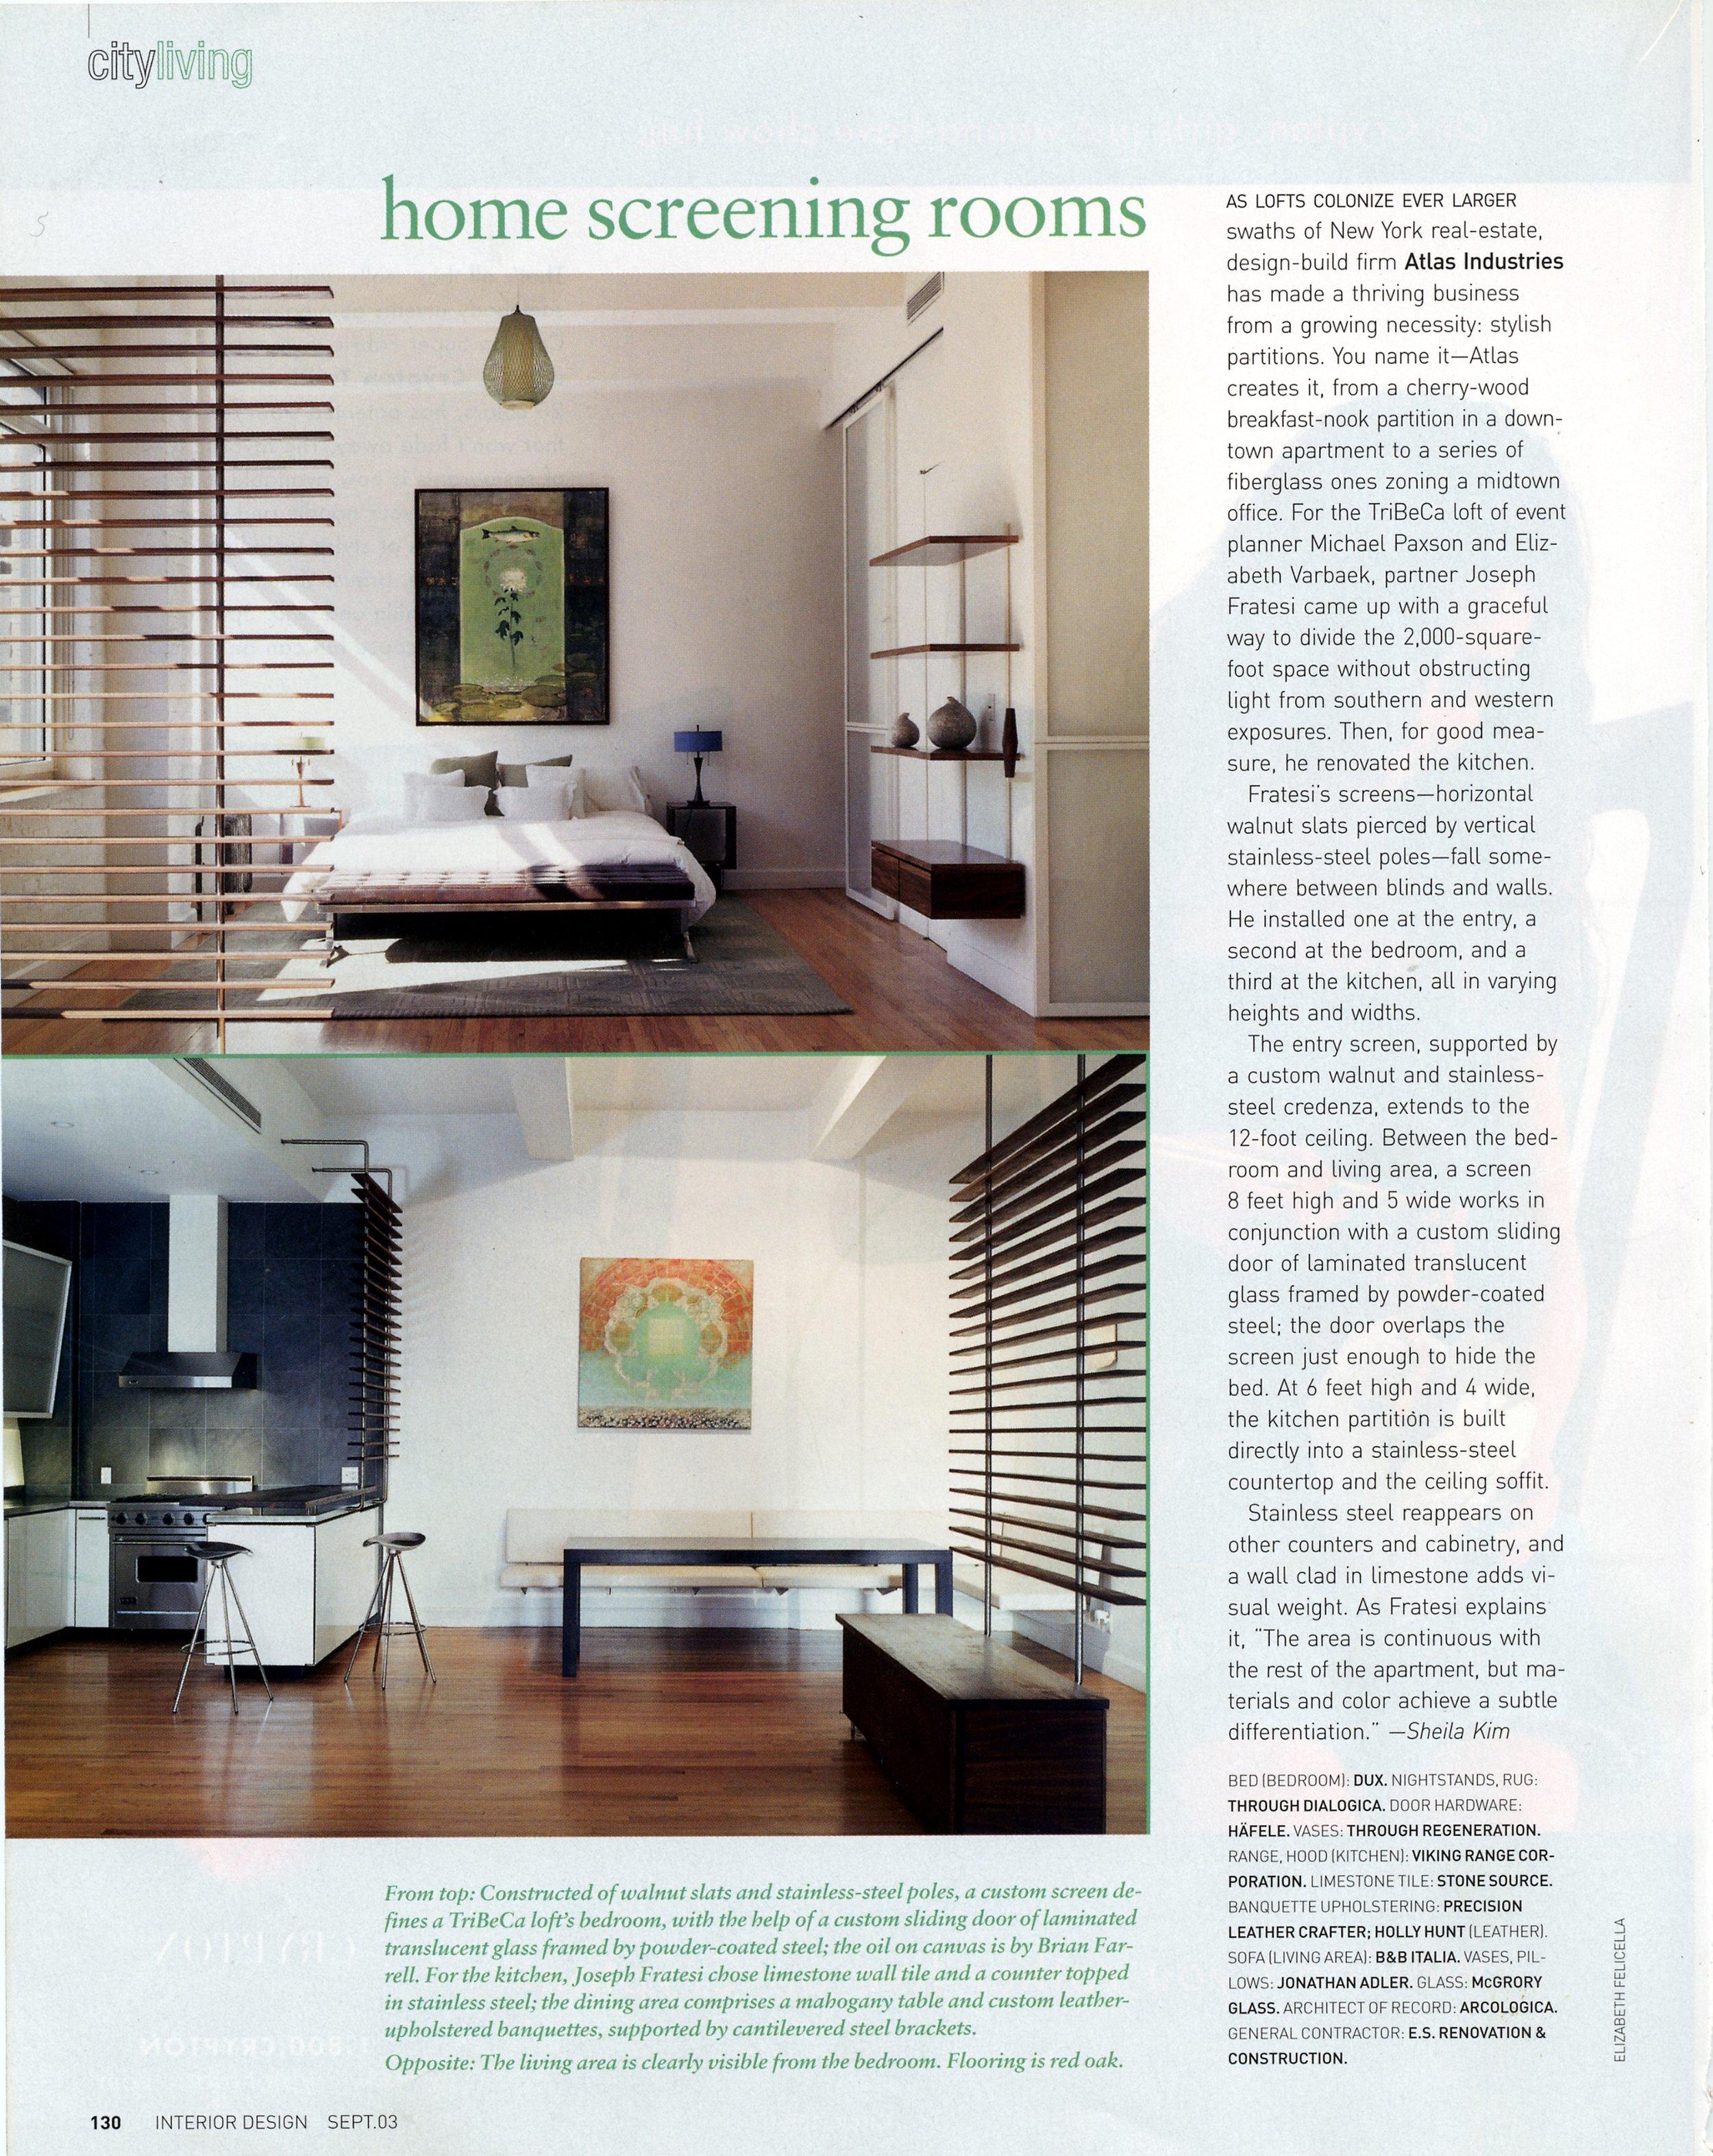 interior design sep 03 02.jpg